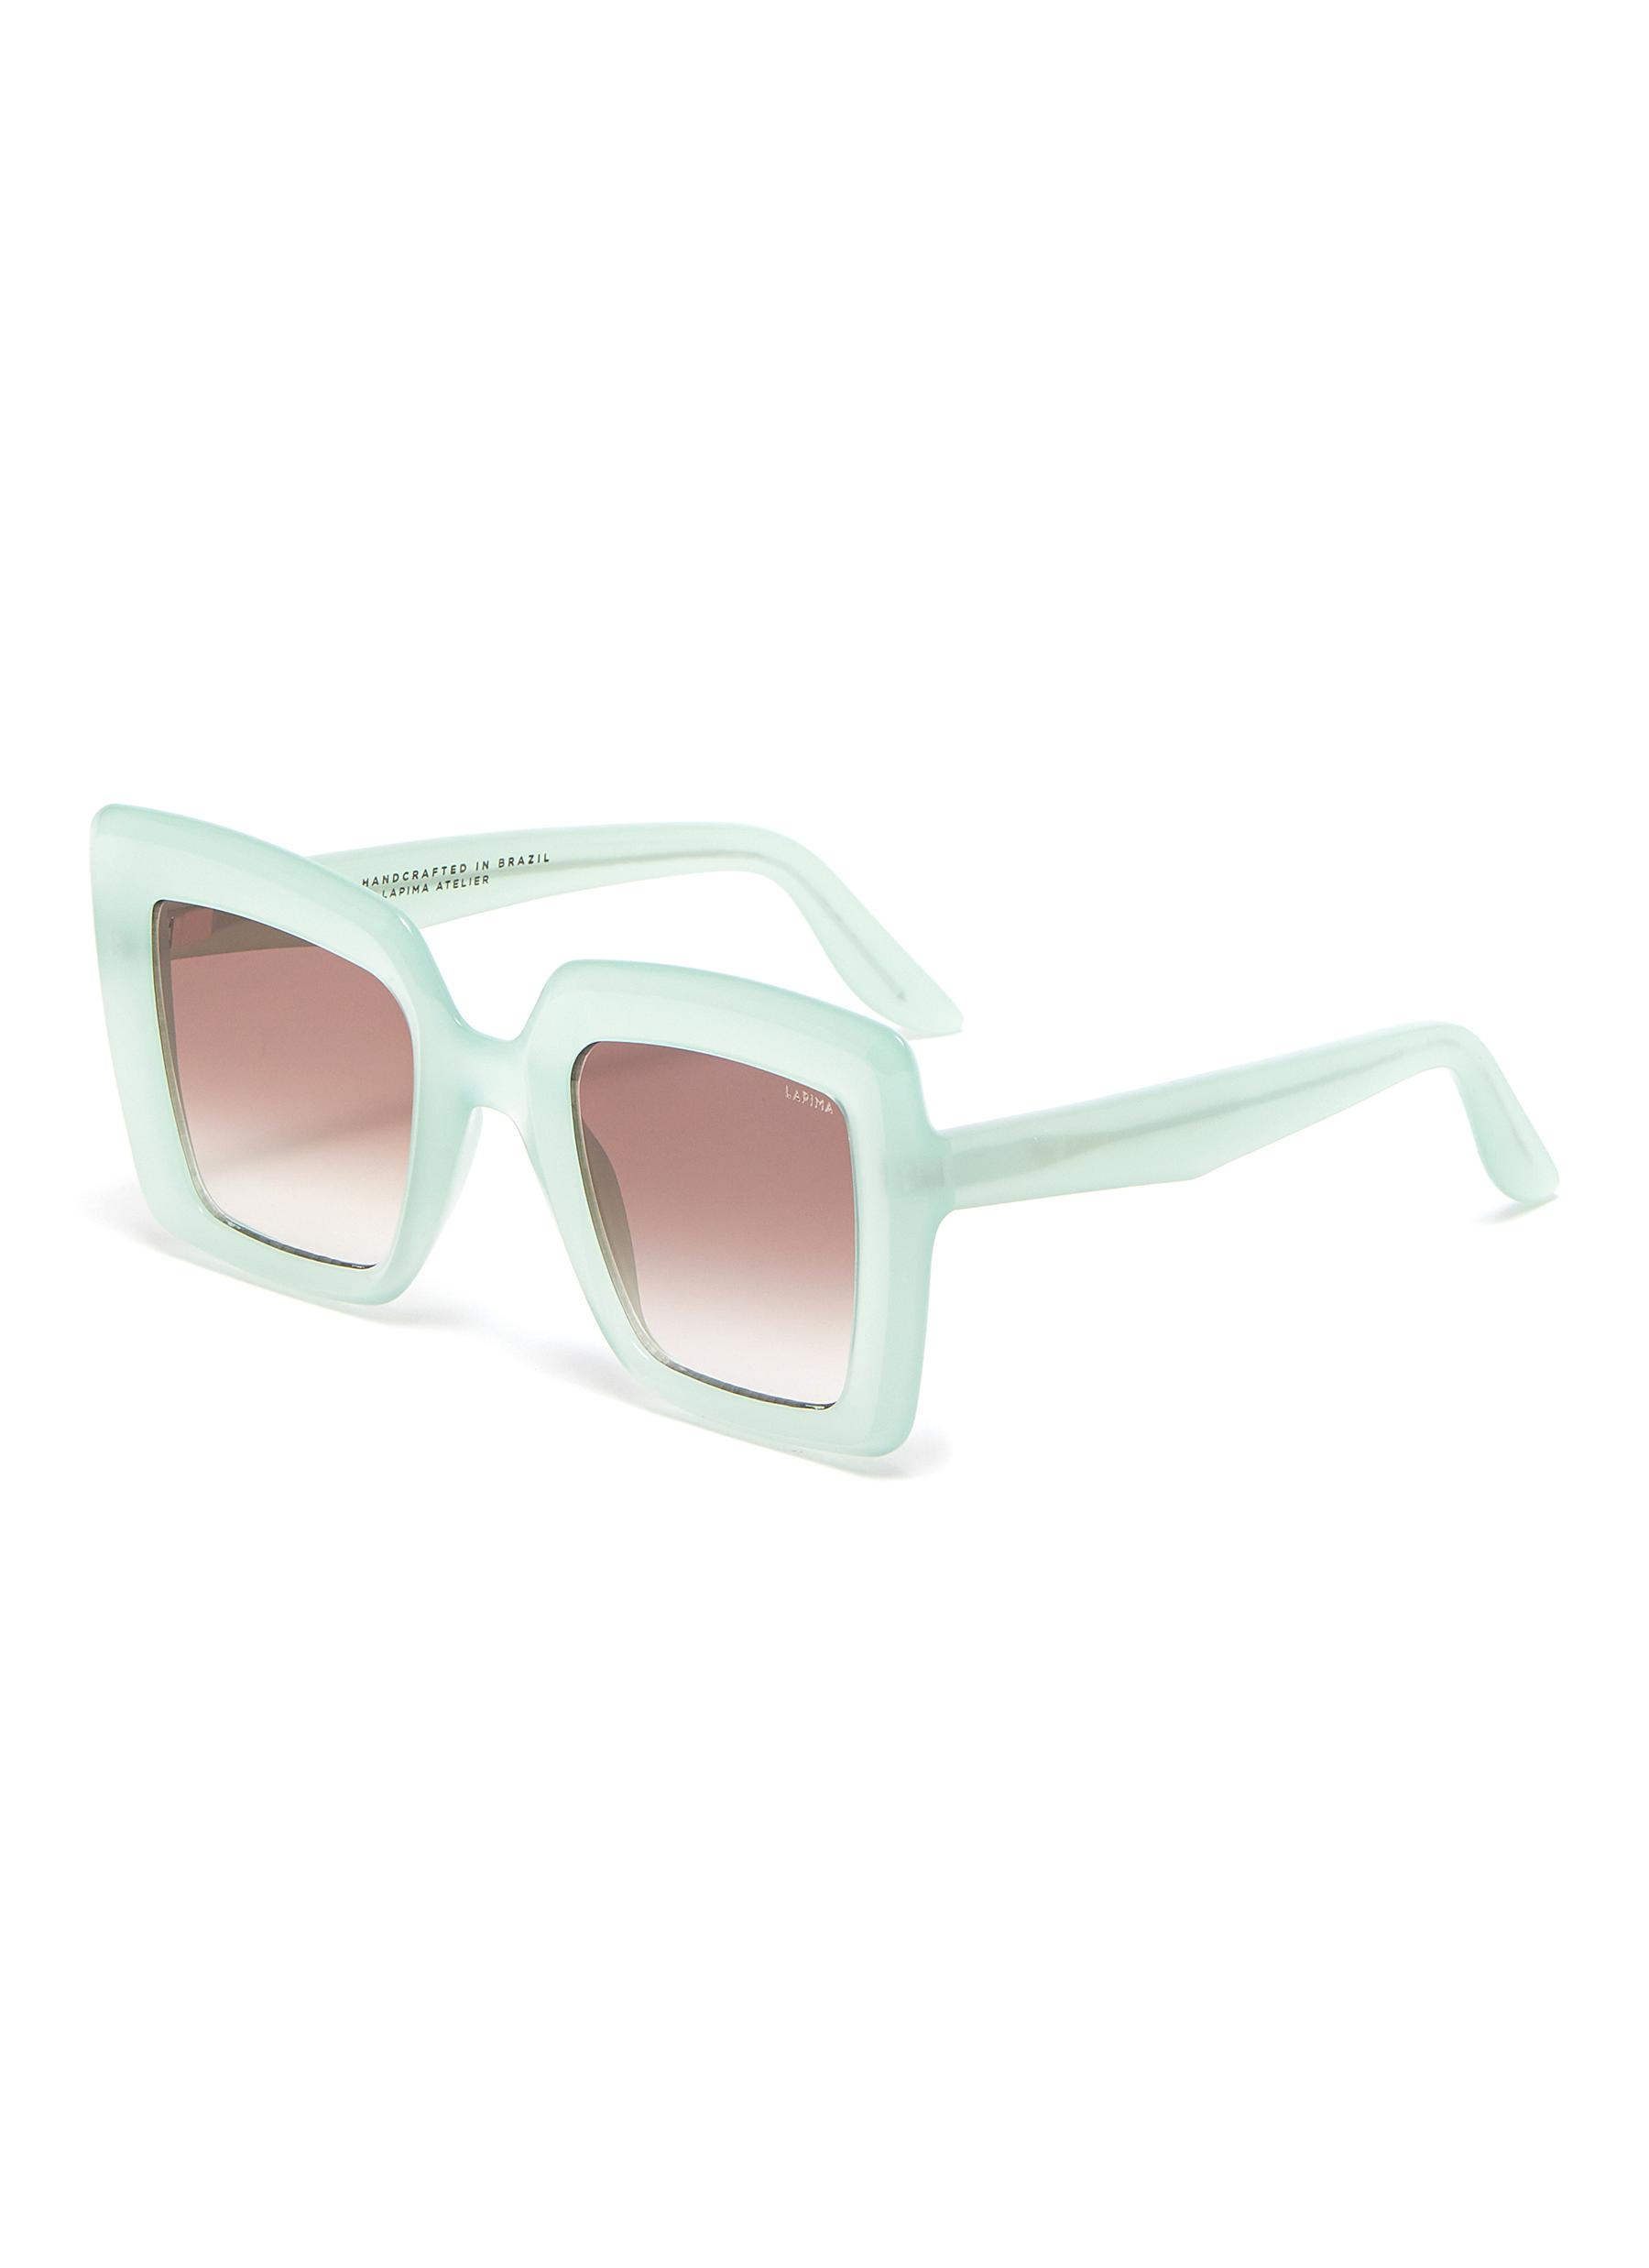 'Teresa' square acetate frame sunglasses